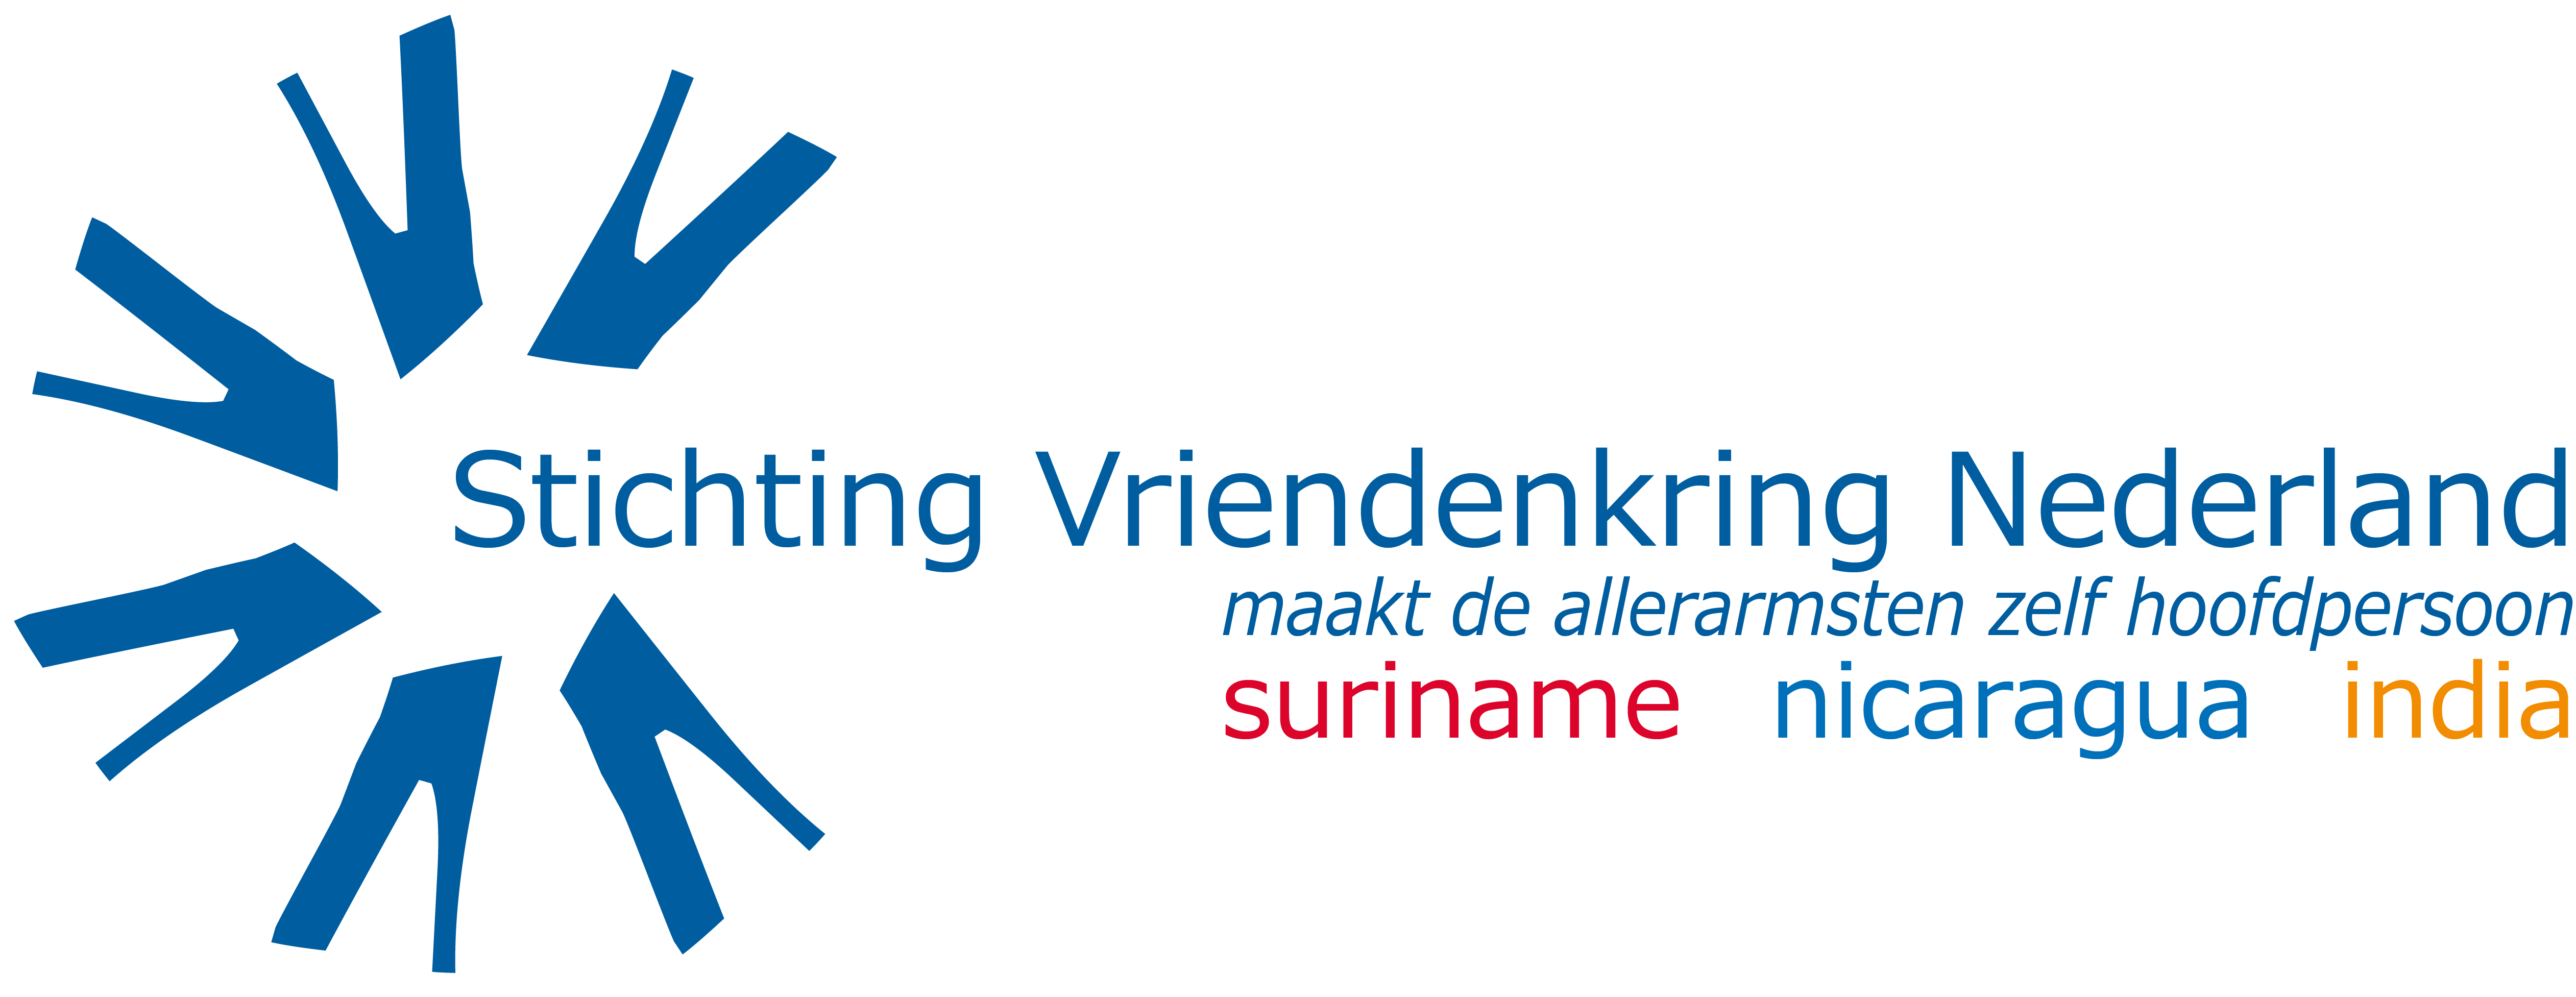 https://usercontent.one/wp/www.vriendenkringnederland.nl/wp-content/uploads/2017/09/cropped-Logo-VKN-1.png